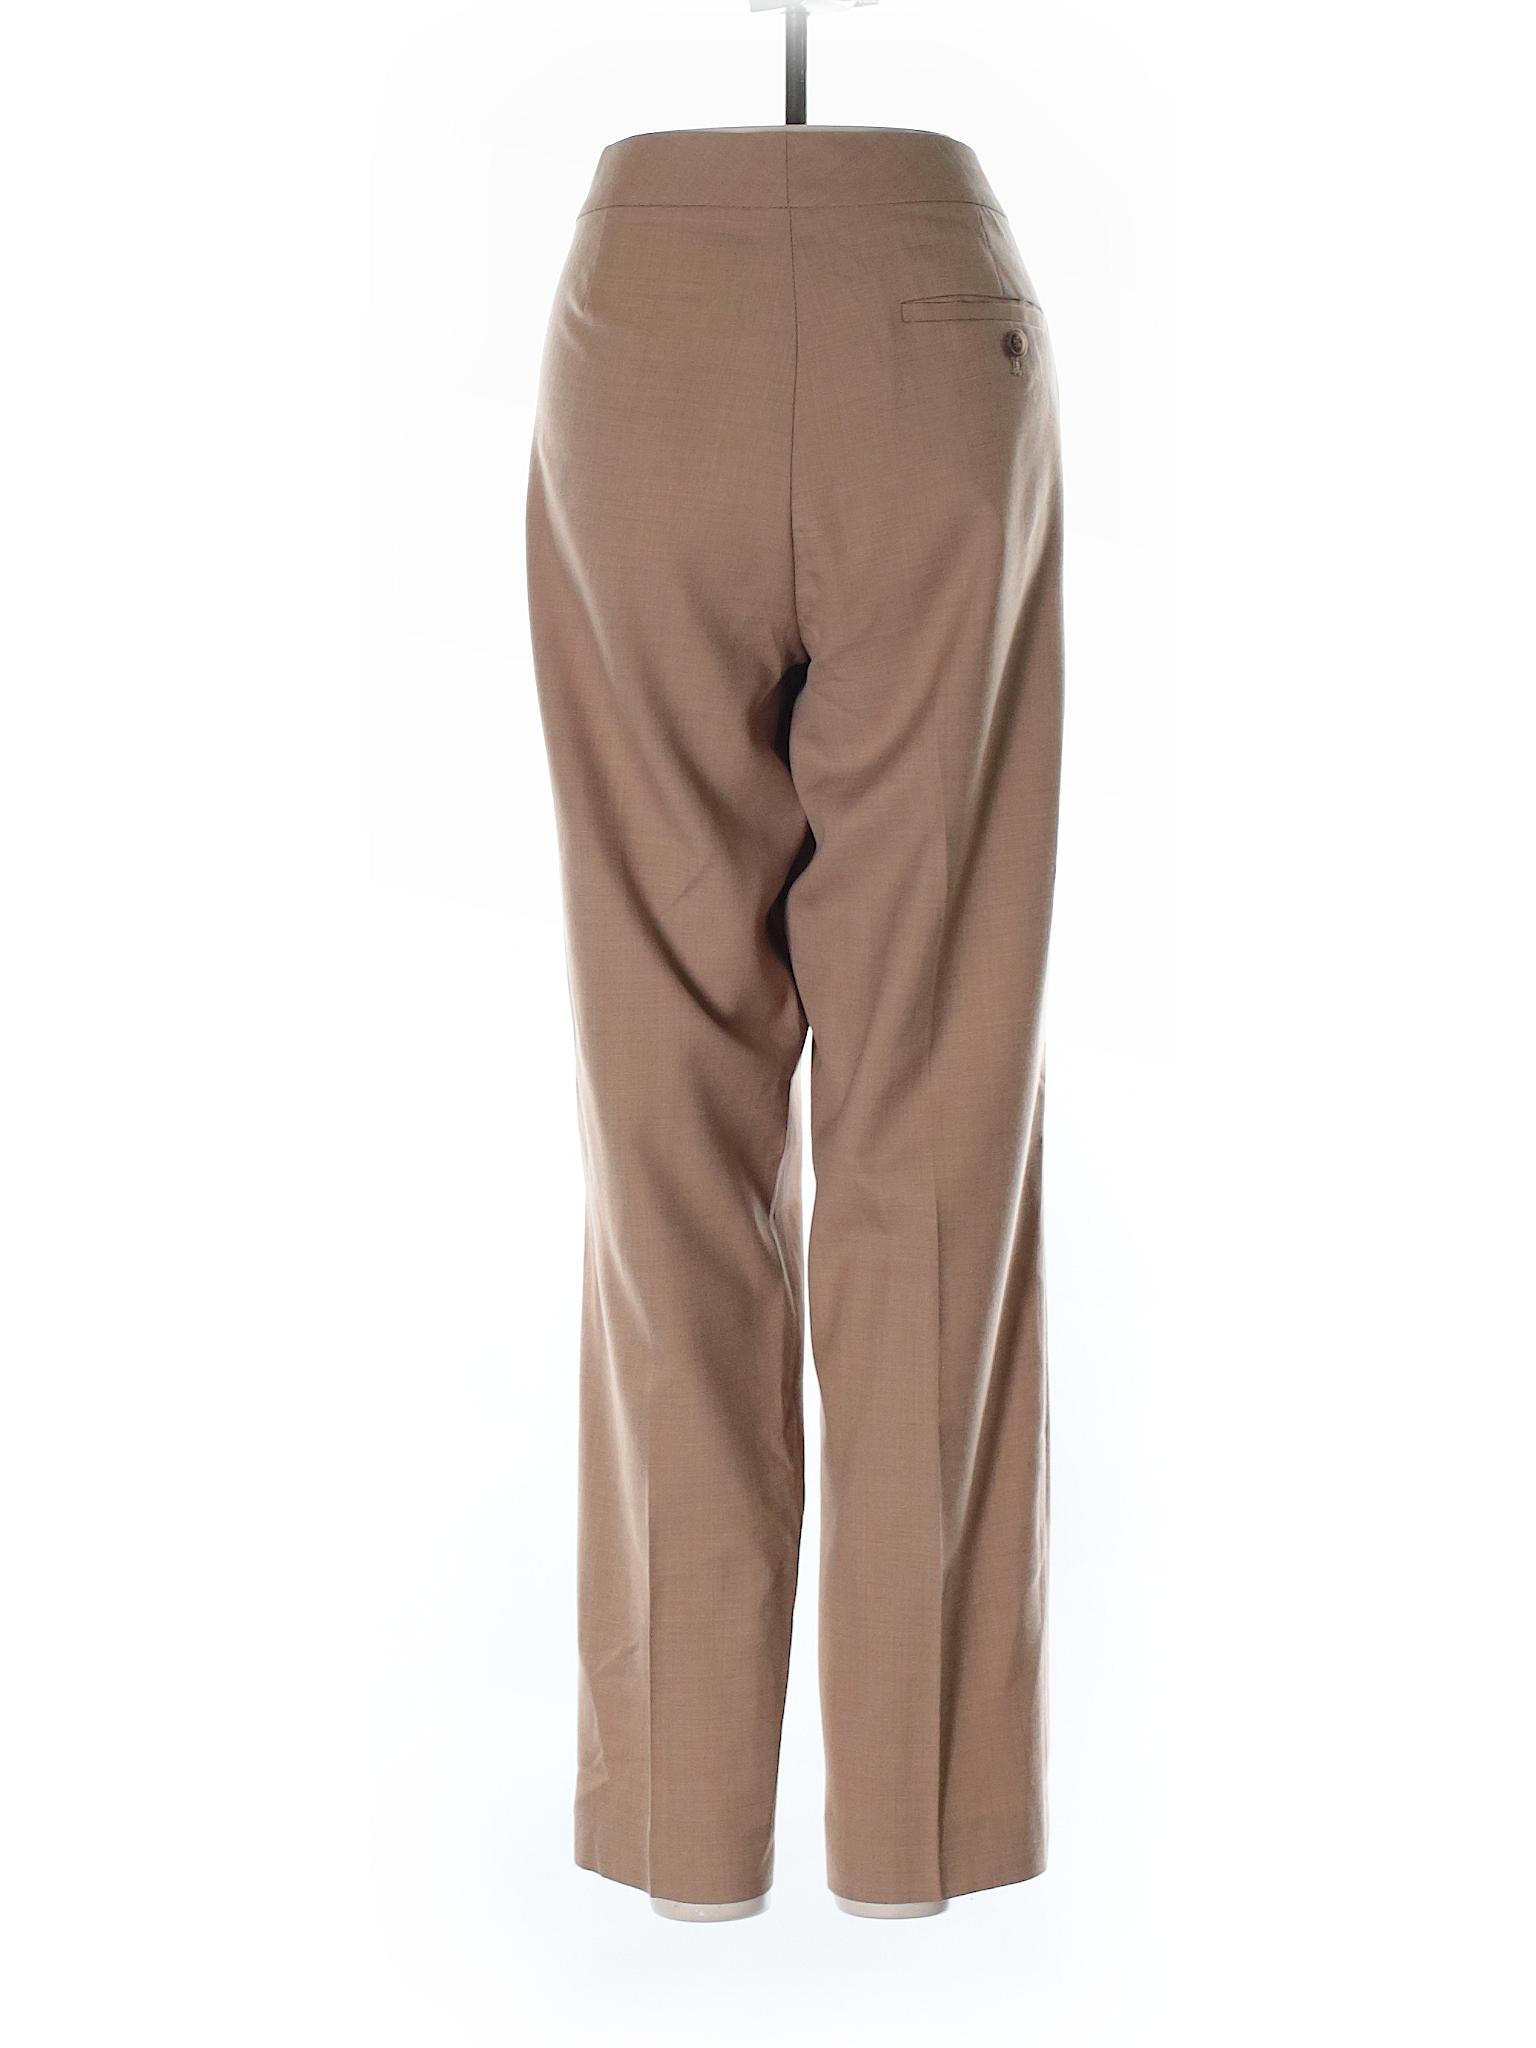 winter Wool Pants J Crew Boutique Xa0pCdC